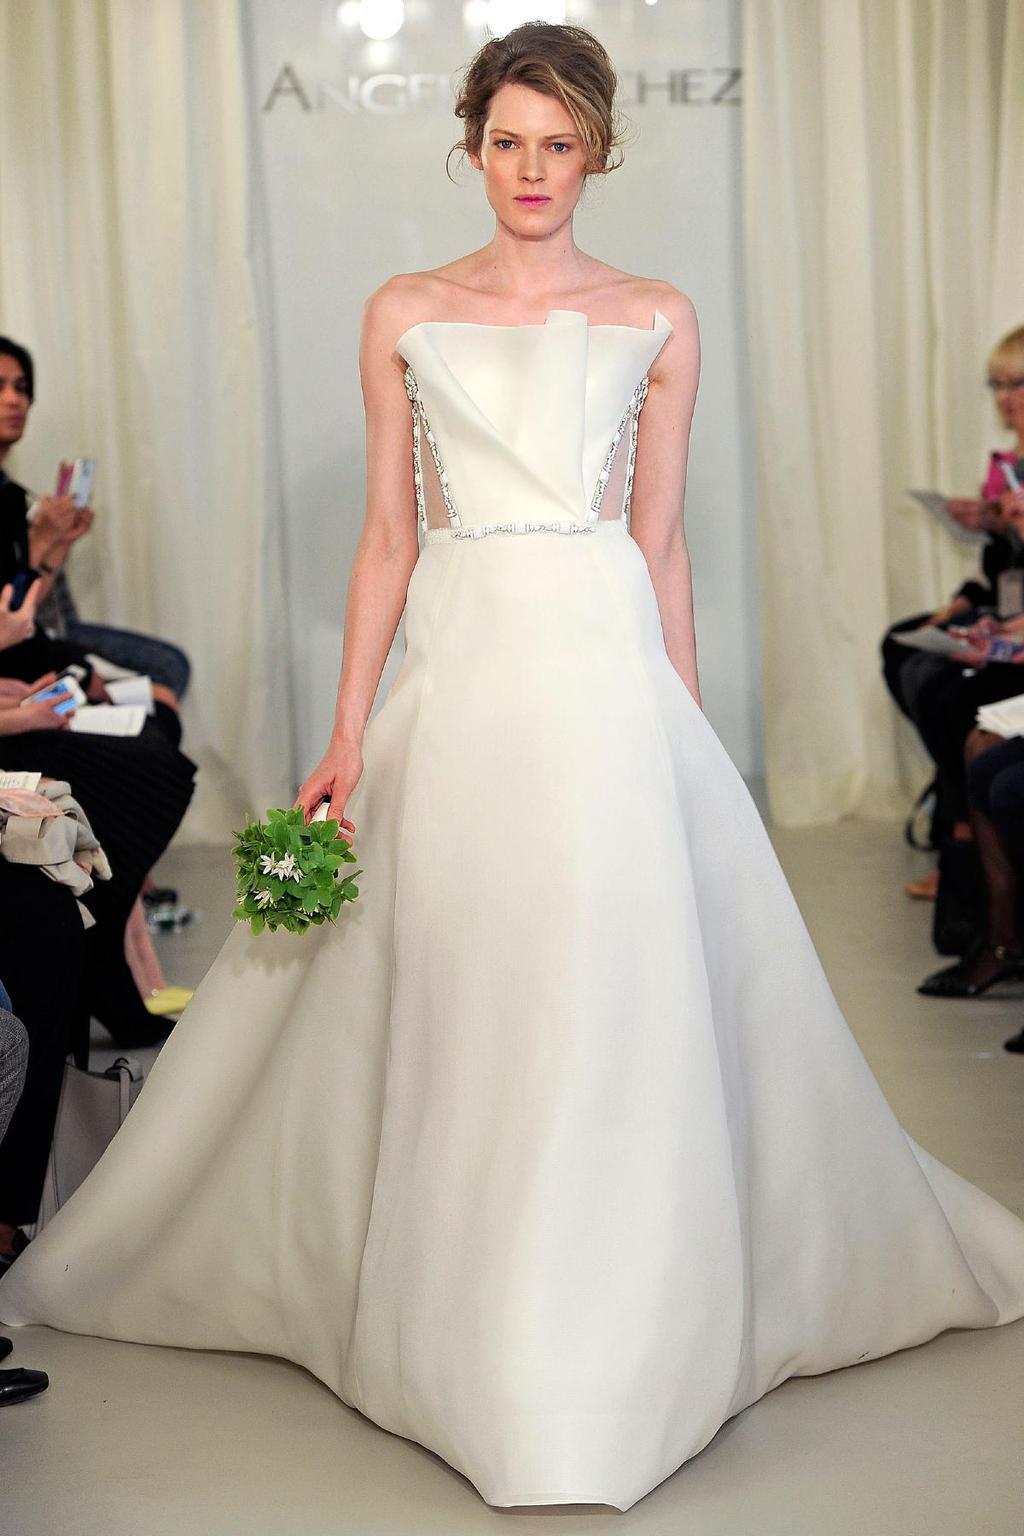 Angel-sanchez-wedding-dress-spring-2014-bridal-4.full